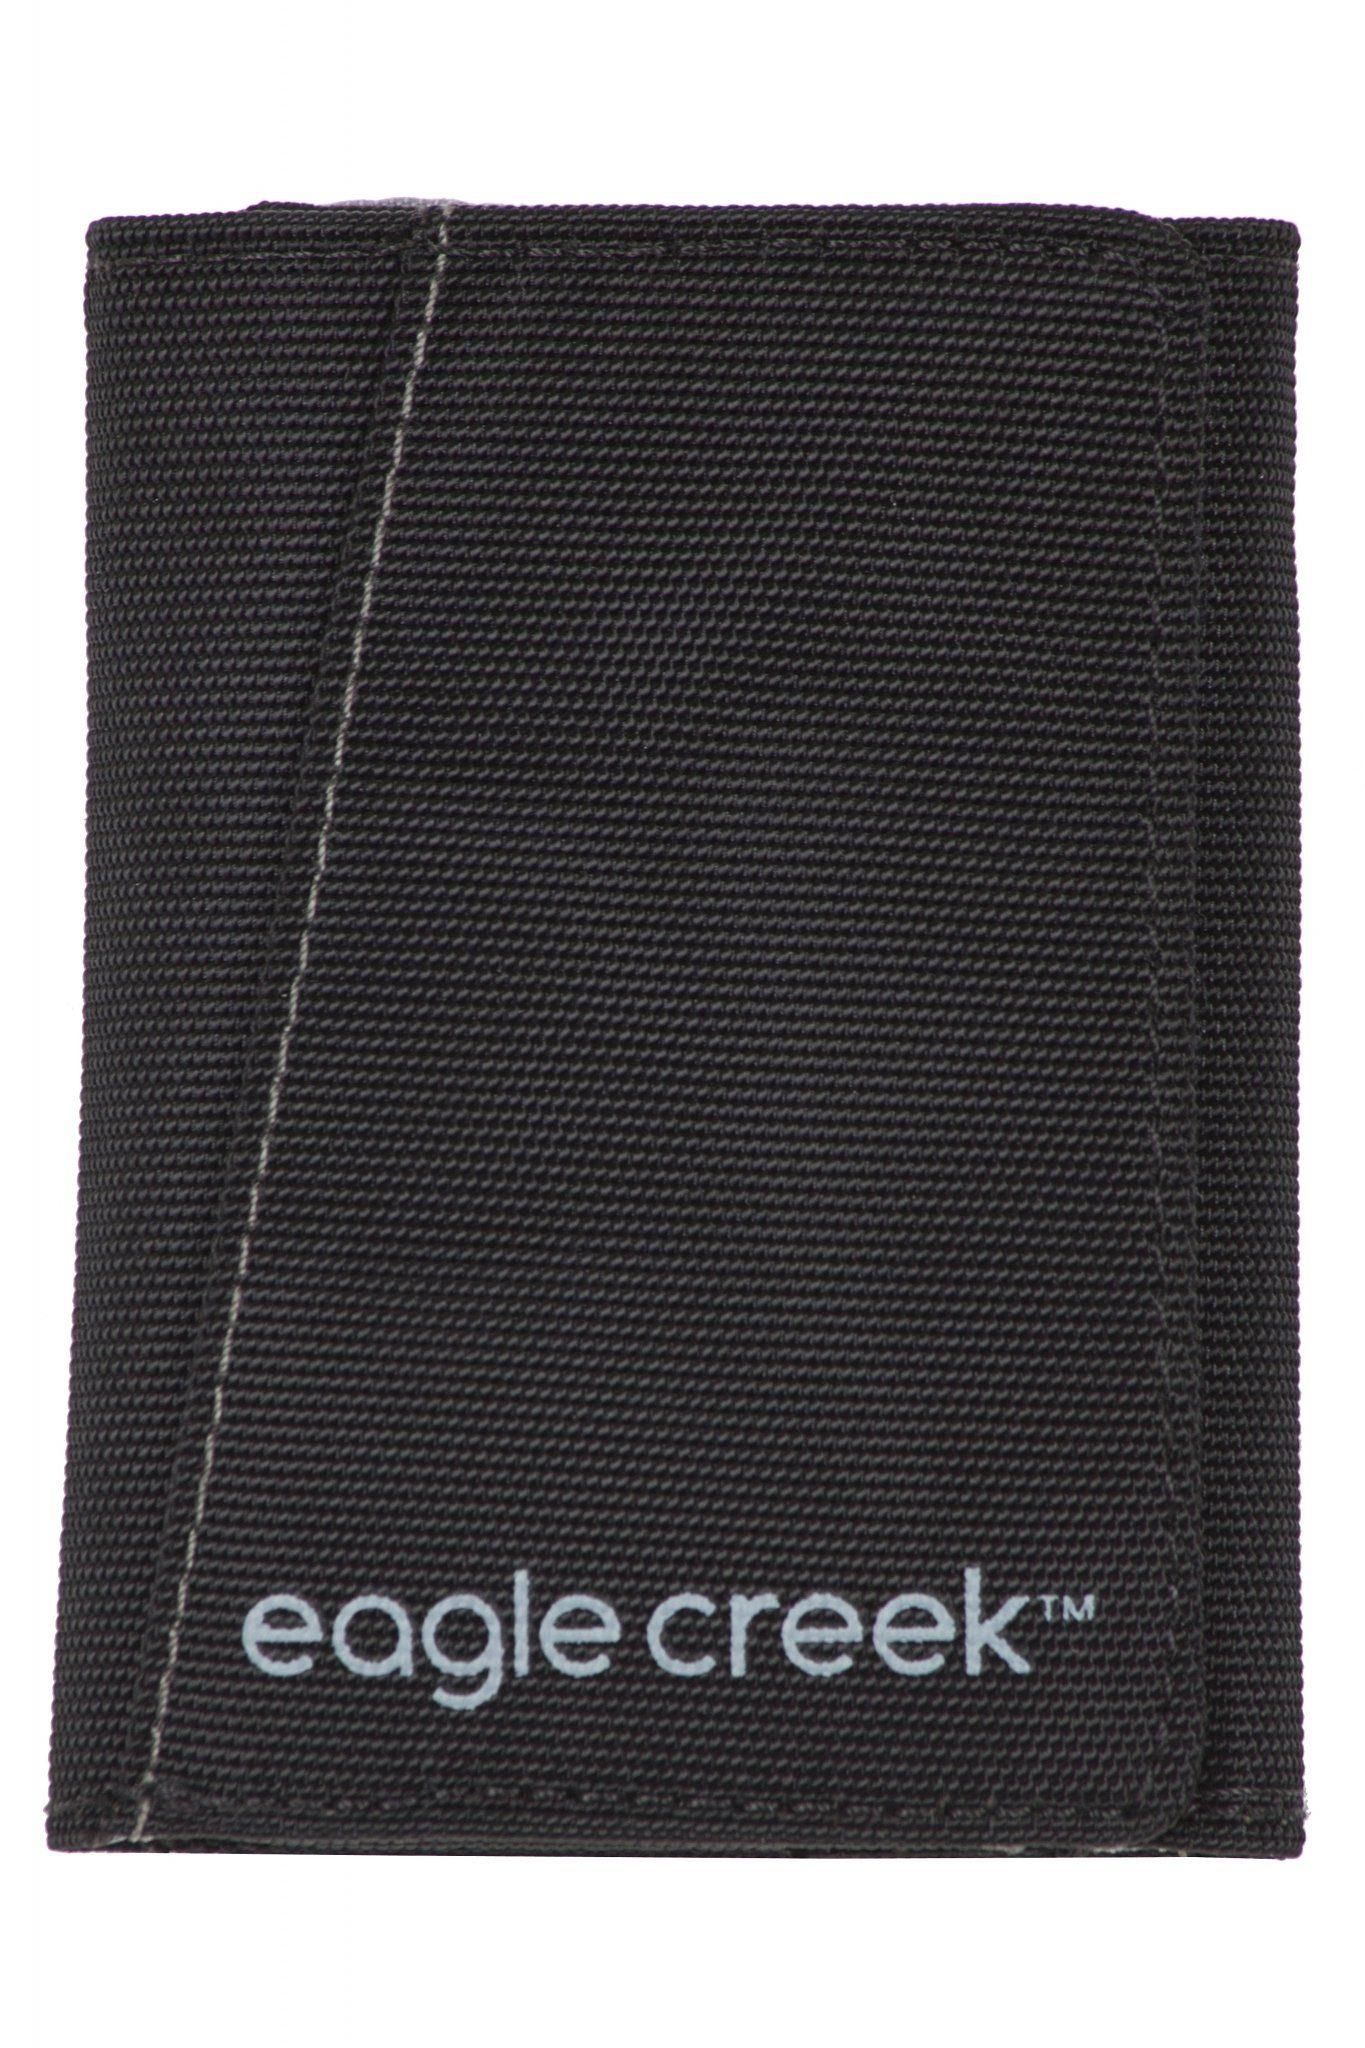 Eagle Creek Wertsachenaufbewahrung »Tri-Fold Wallet«